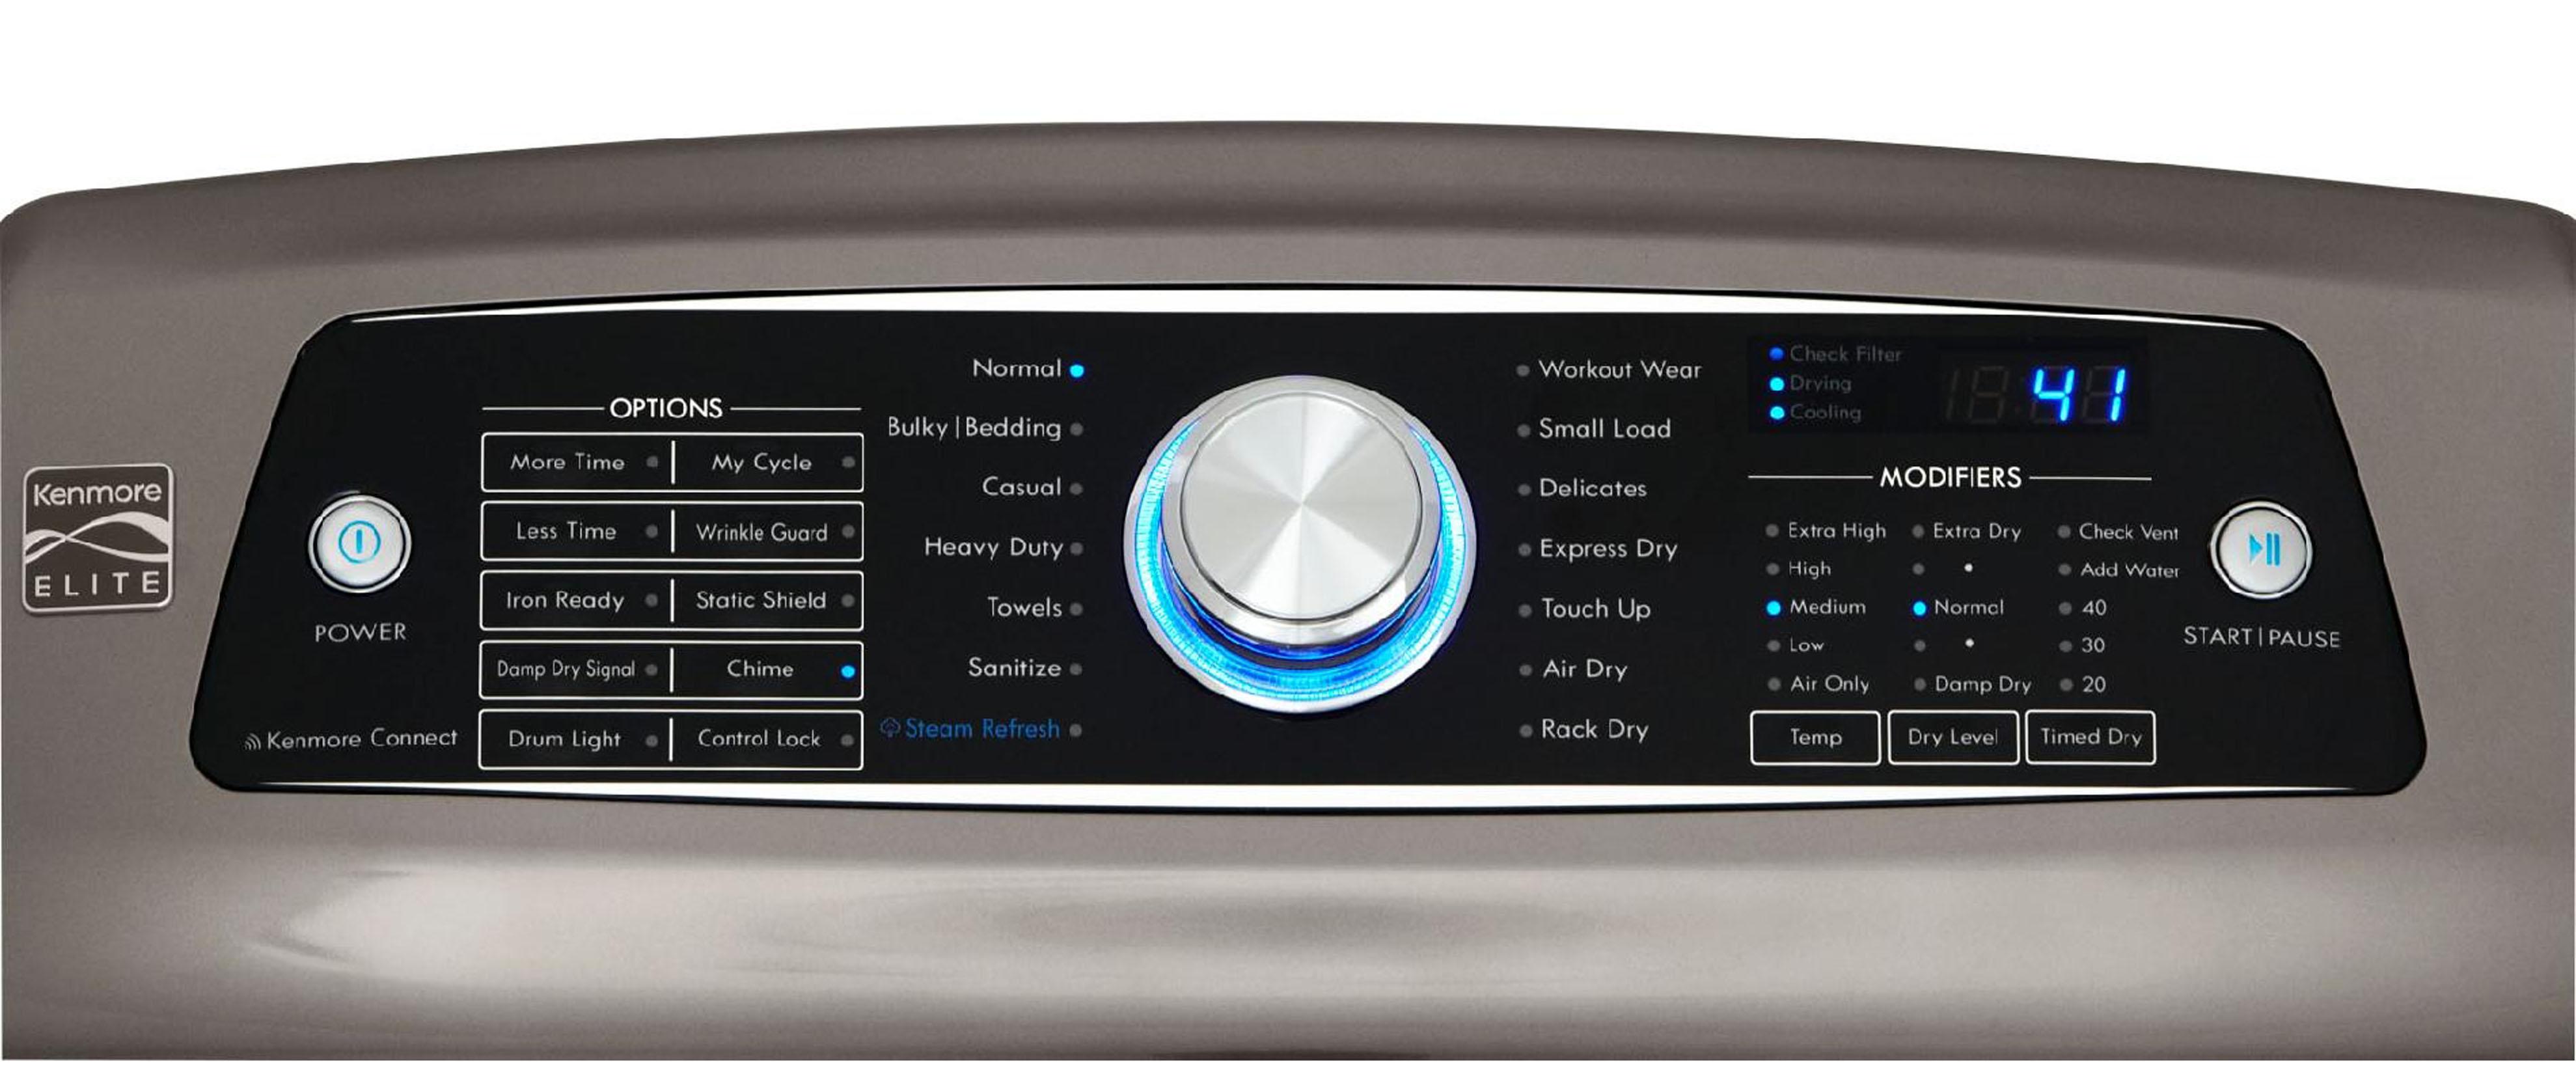 Kenmore Elite 7.3 cu. ft. Electric Dryer w/ Steam – Metallic Gray